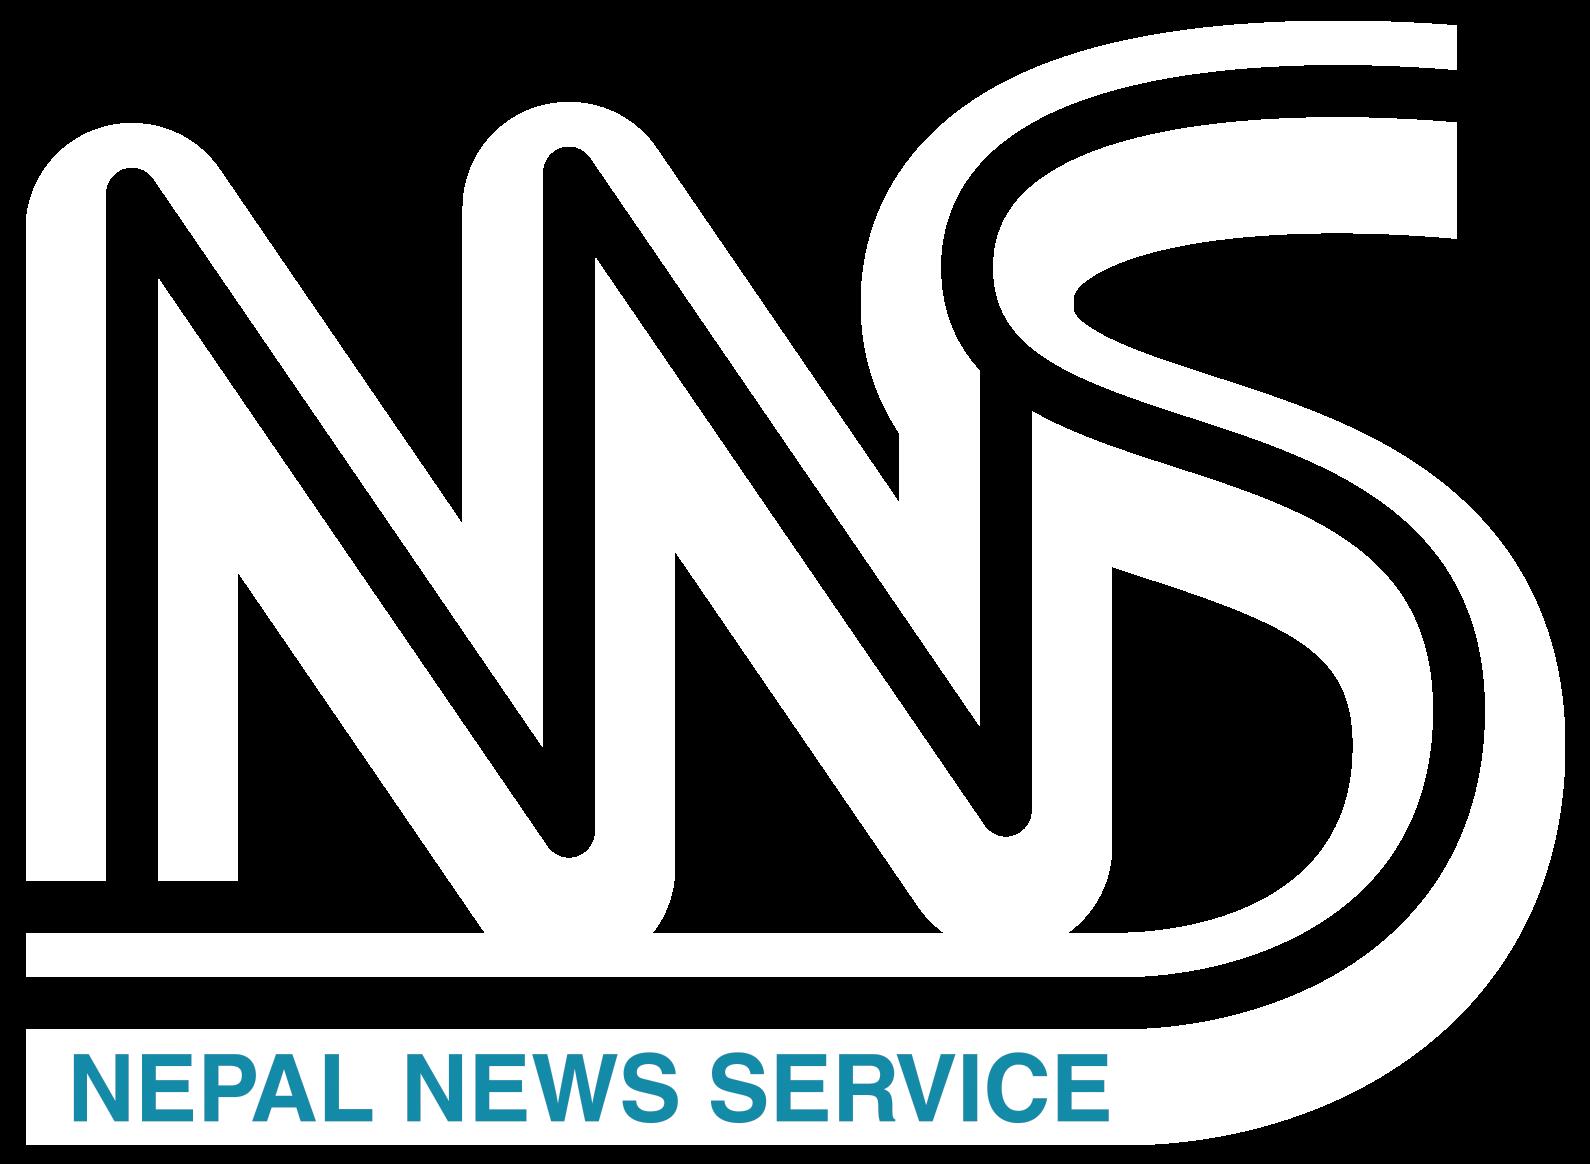 Nepal News Service